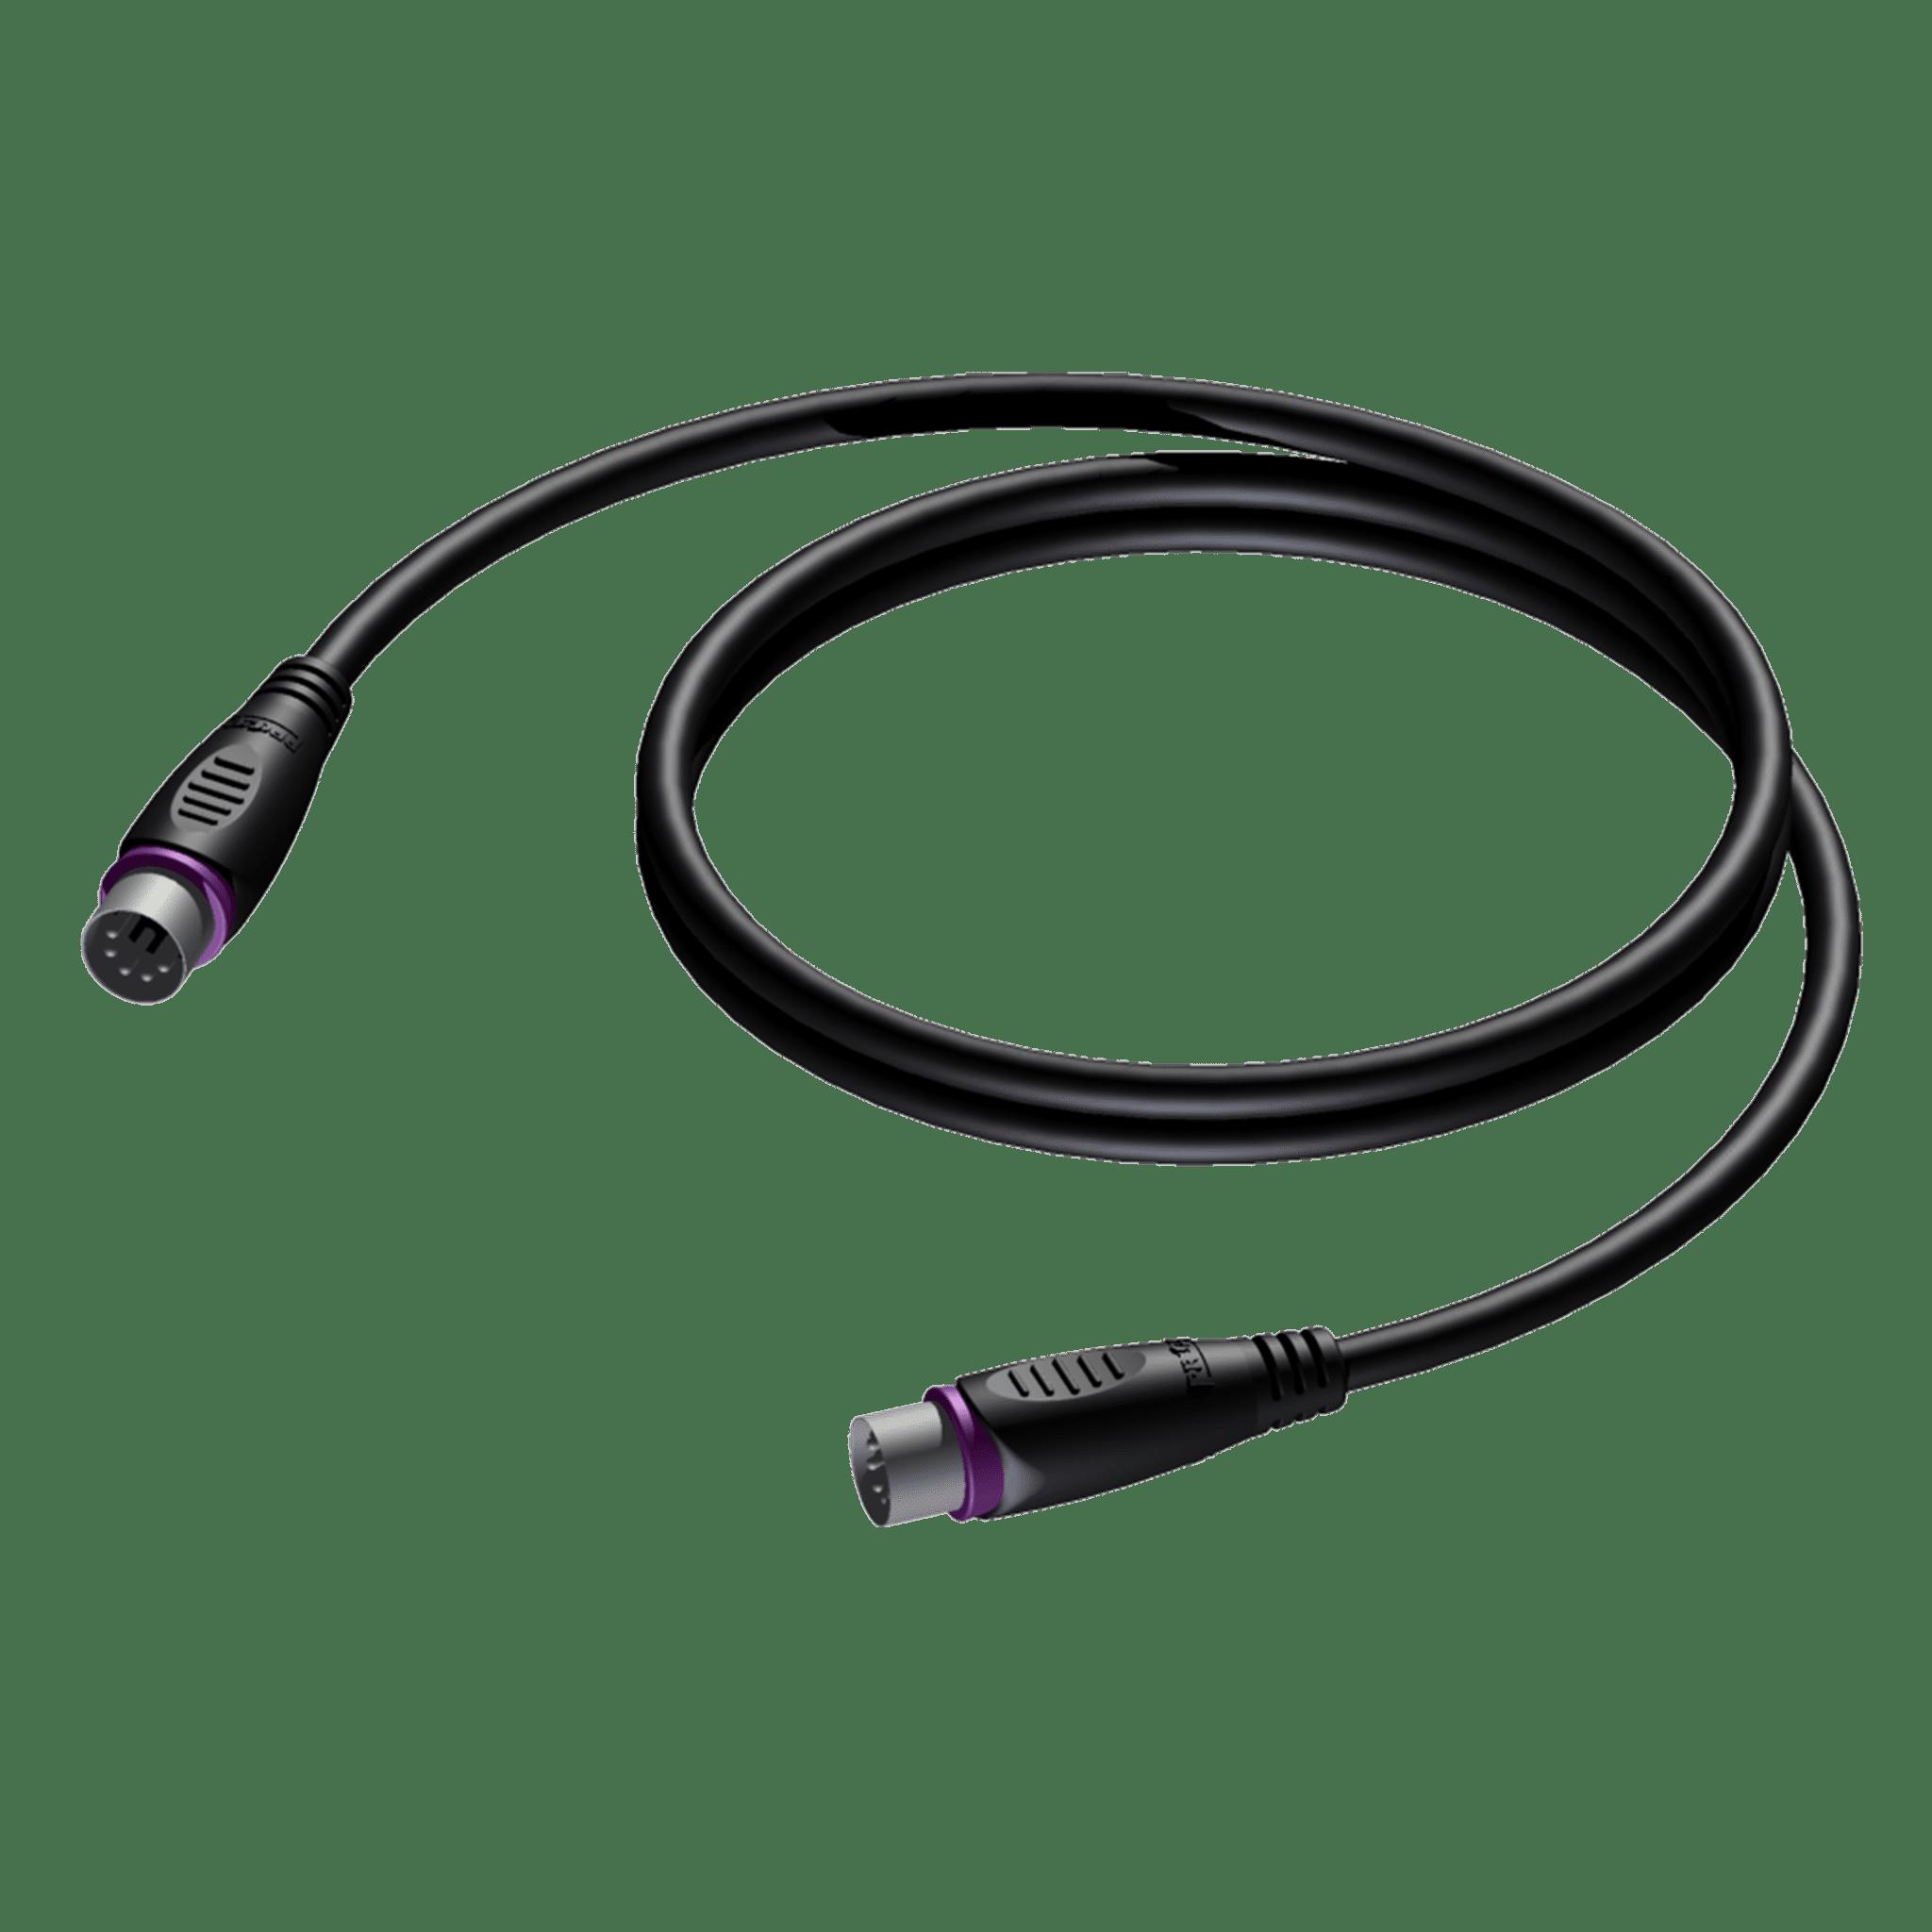 CXM400 - Midi cable - DIN 5 -DIN 5